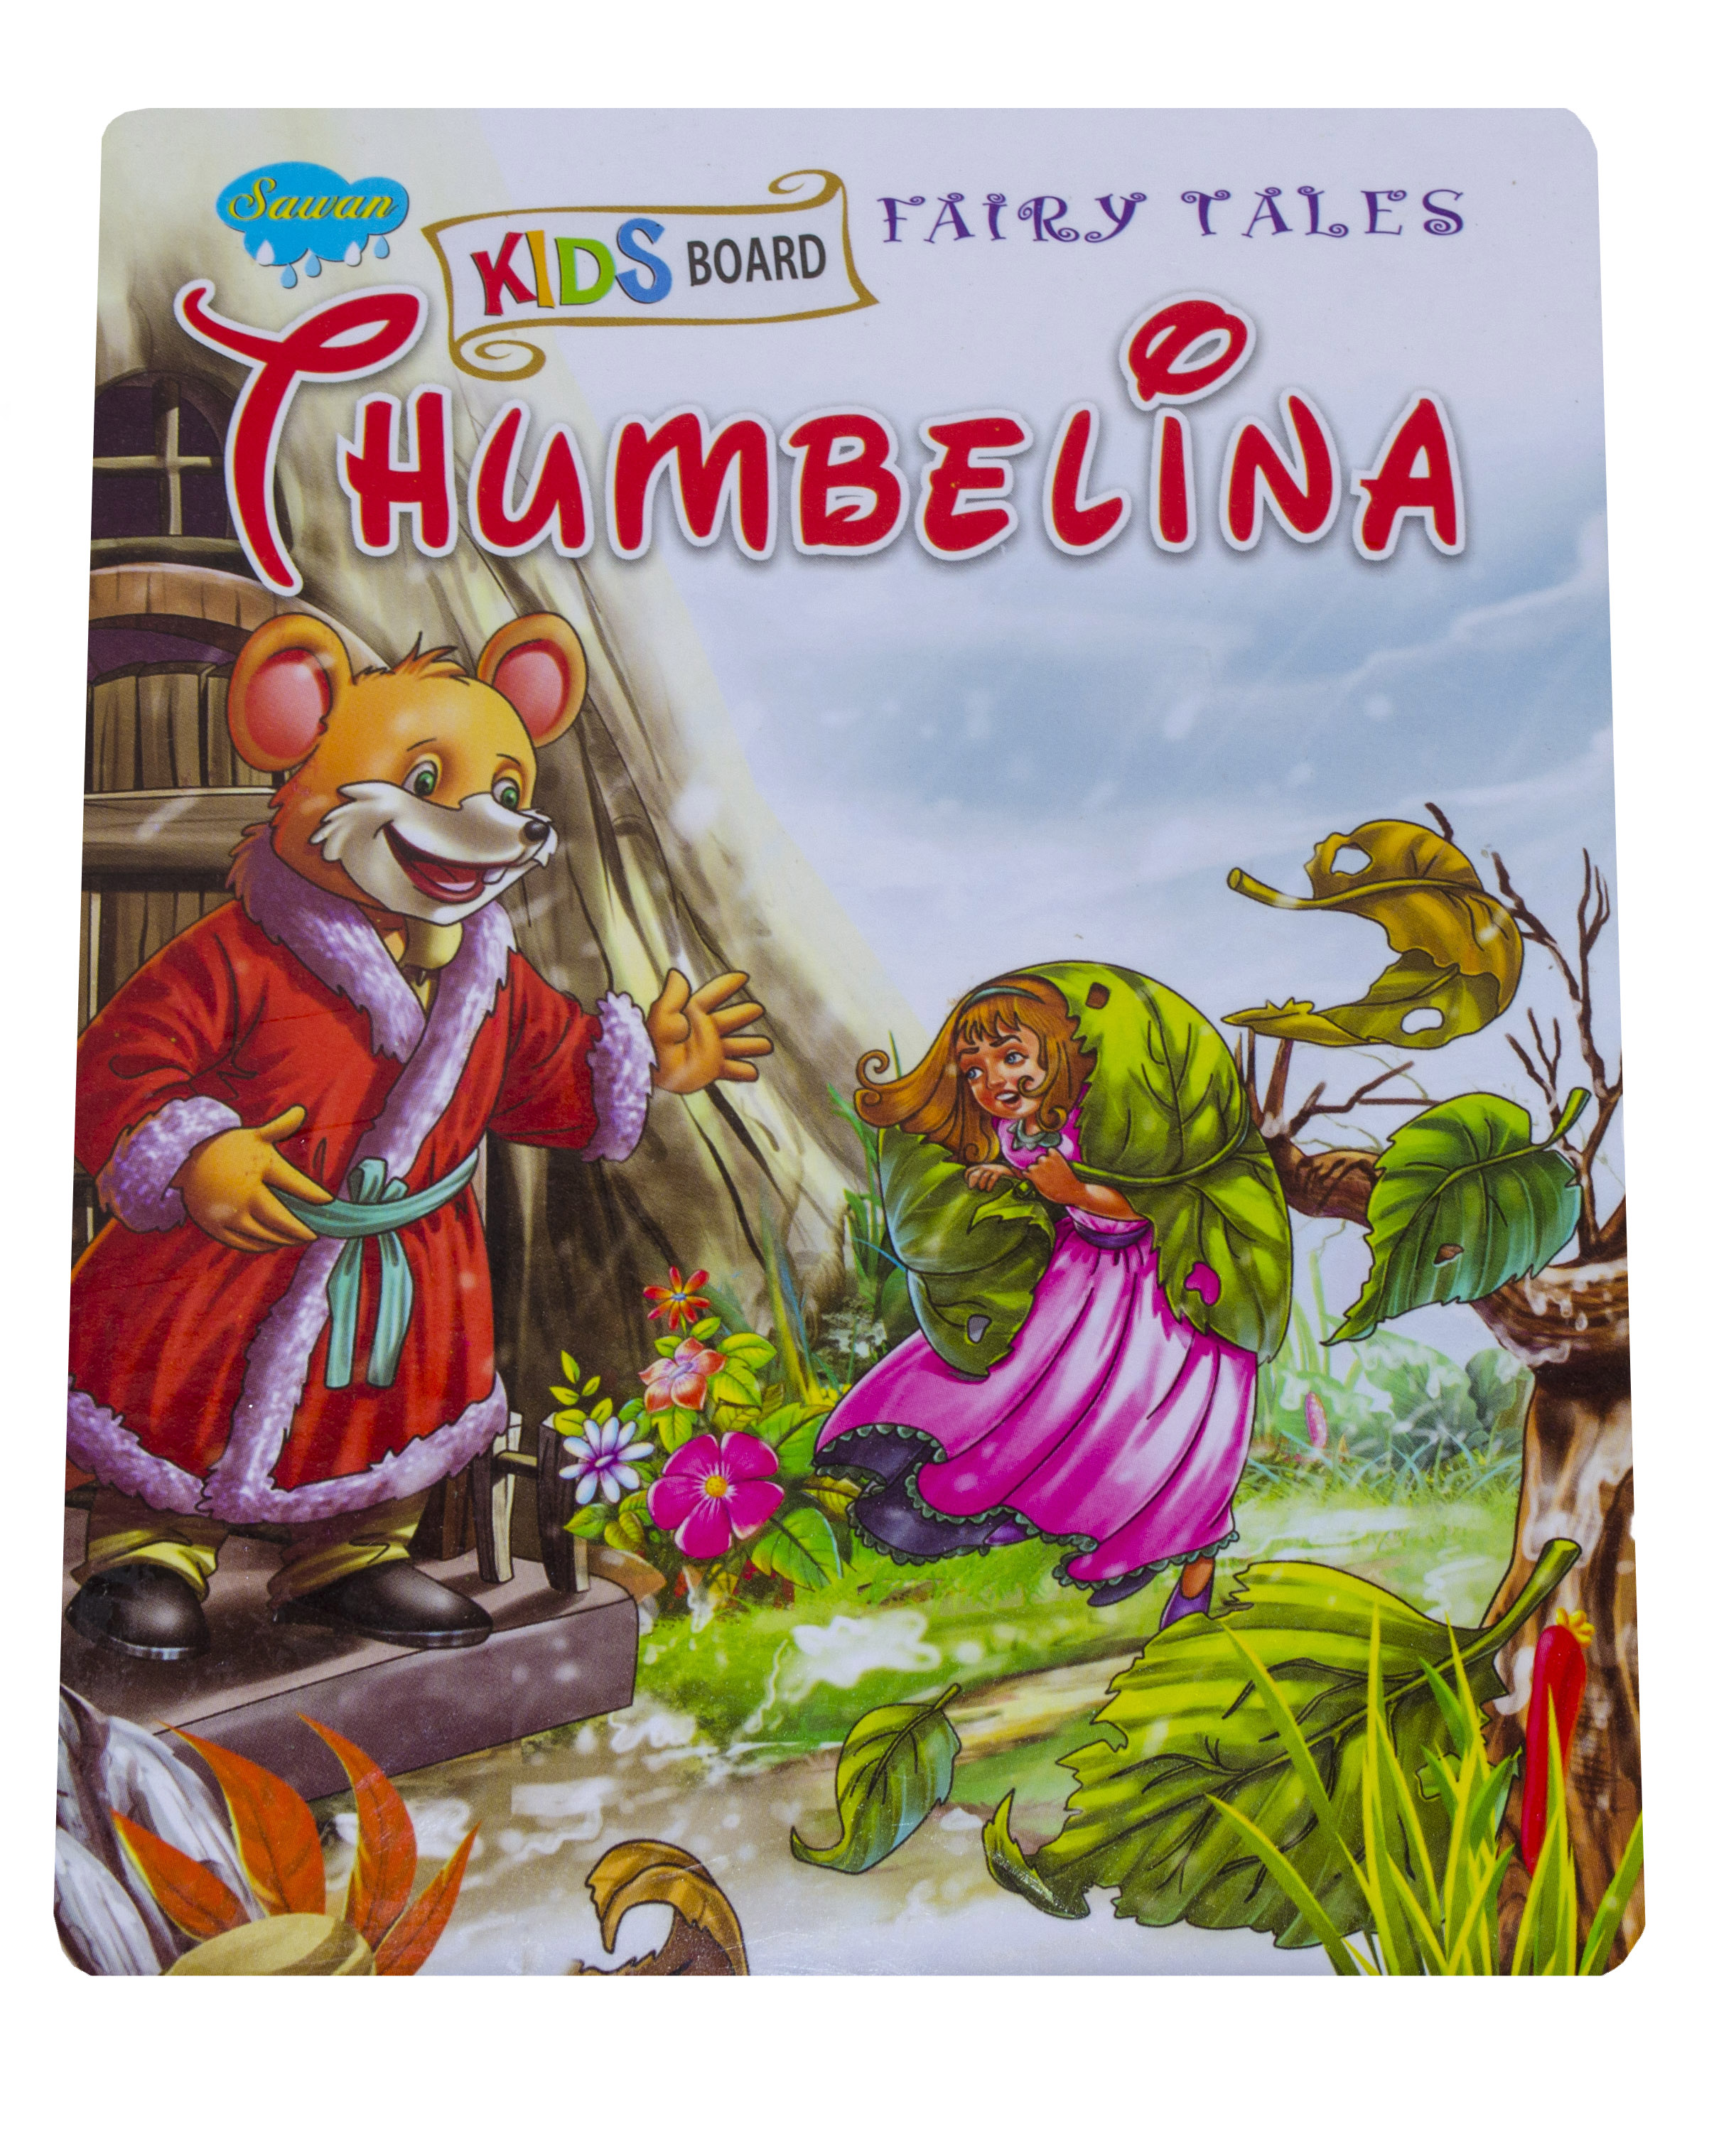 Kids Board Fairy Tales - Thumbelina